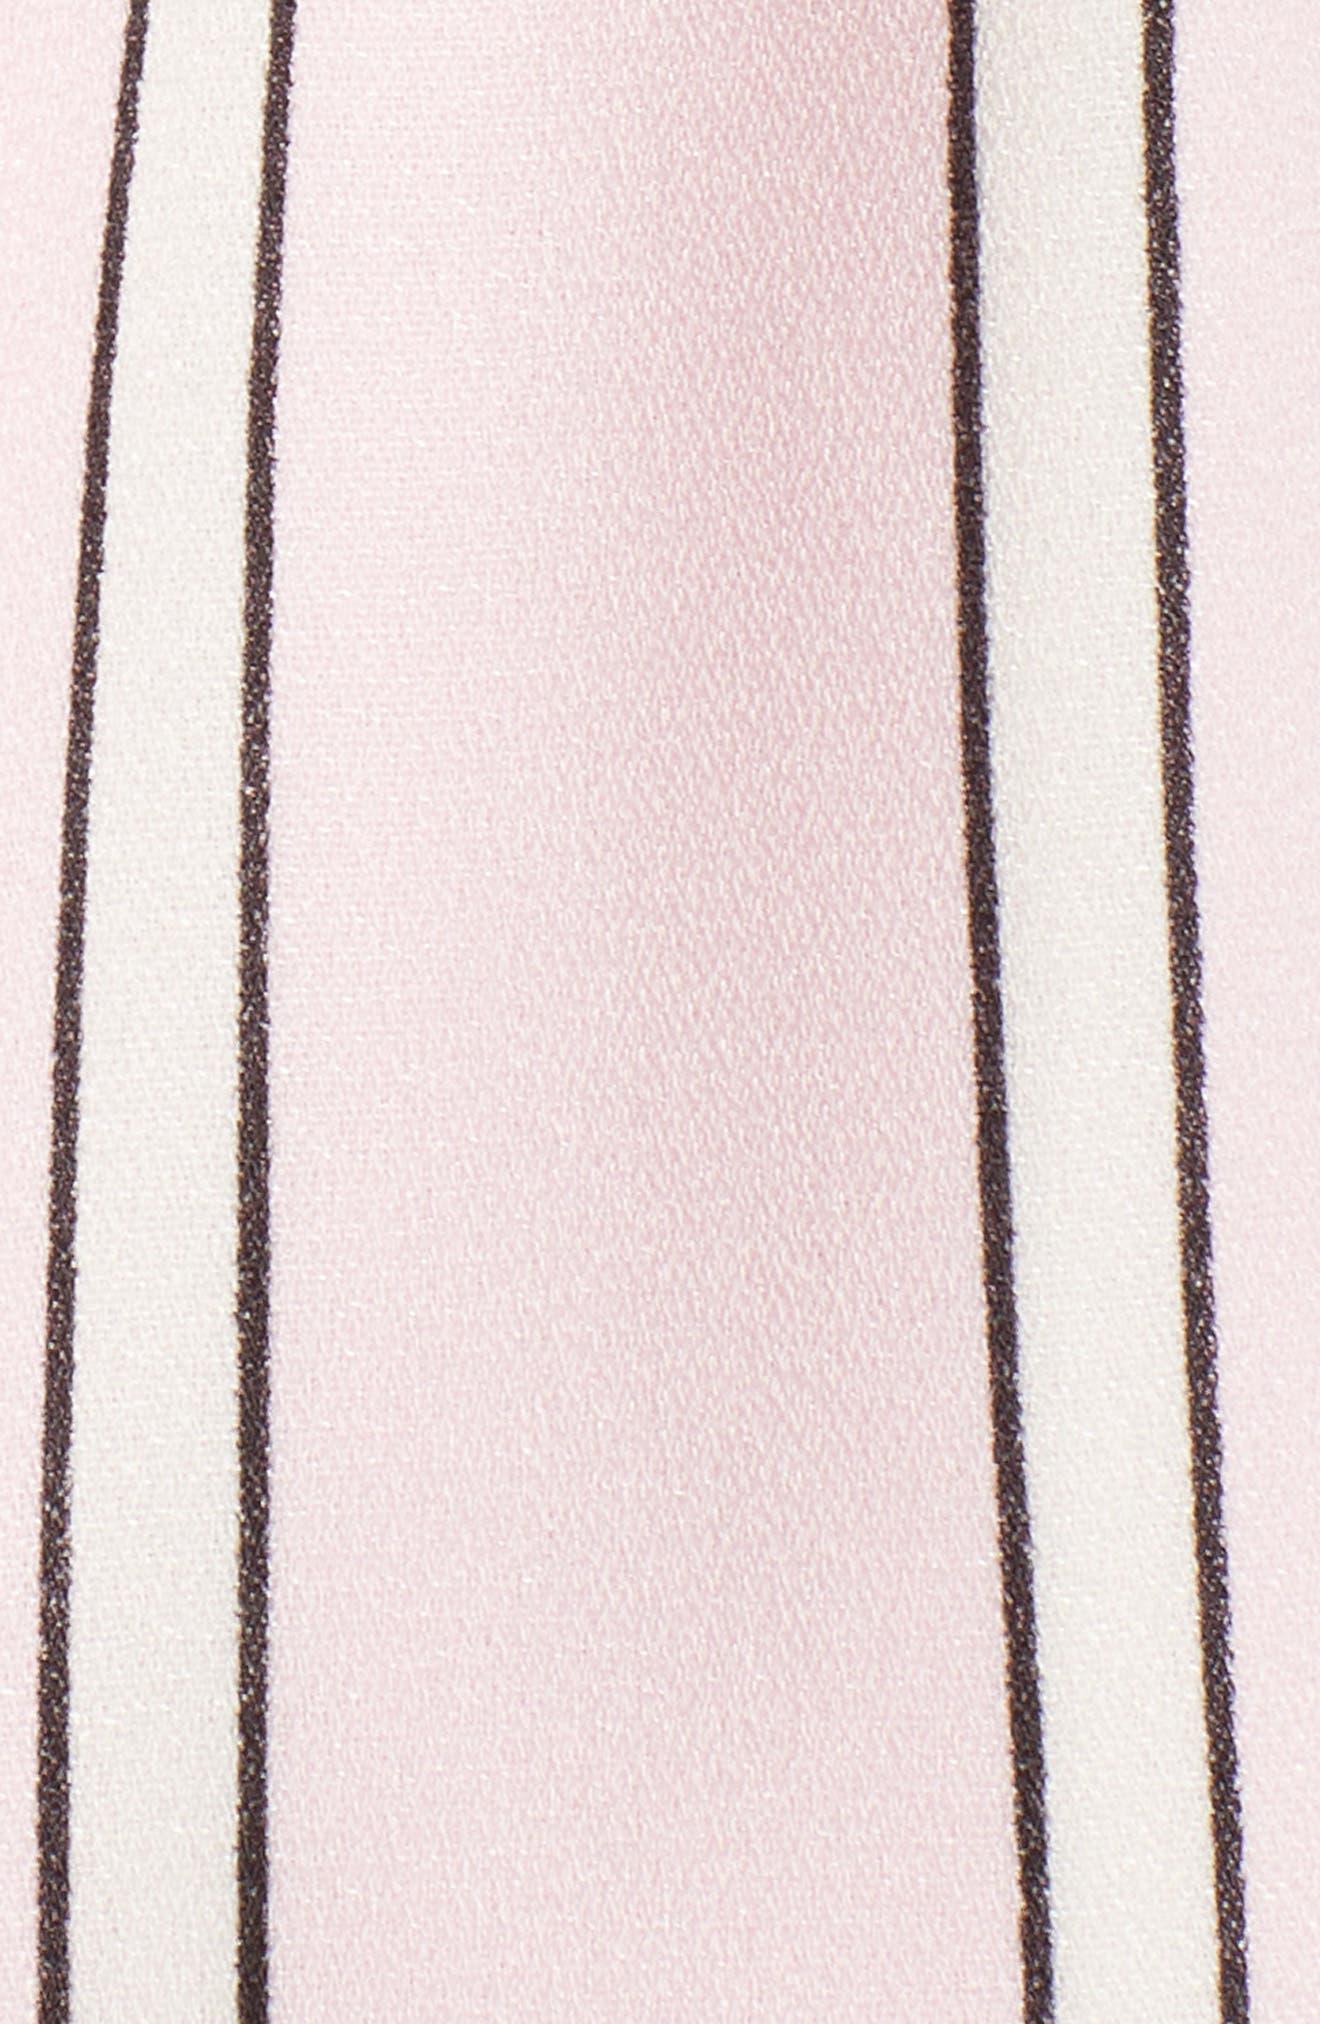 Tie Front Cutout Romper,                             Alternate thumbnail 6, color,                             Pink Stripe